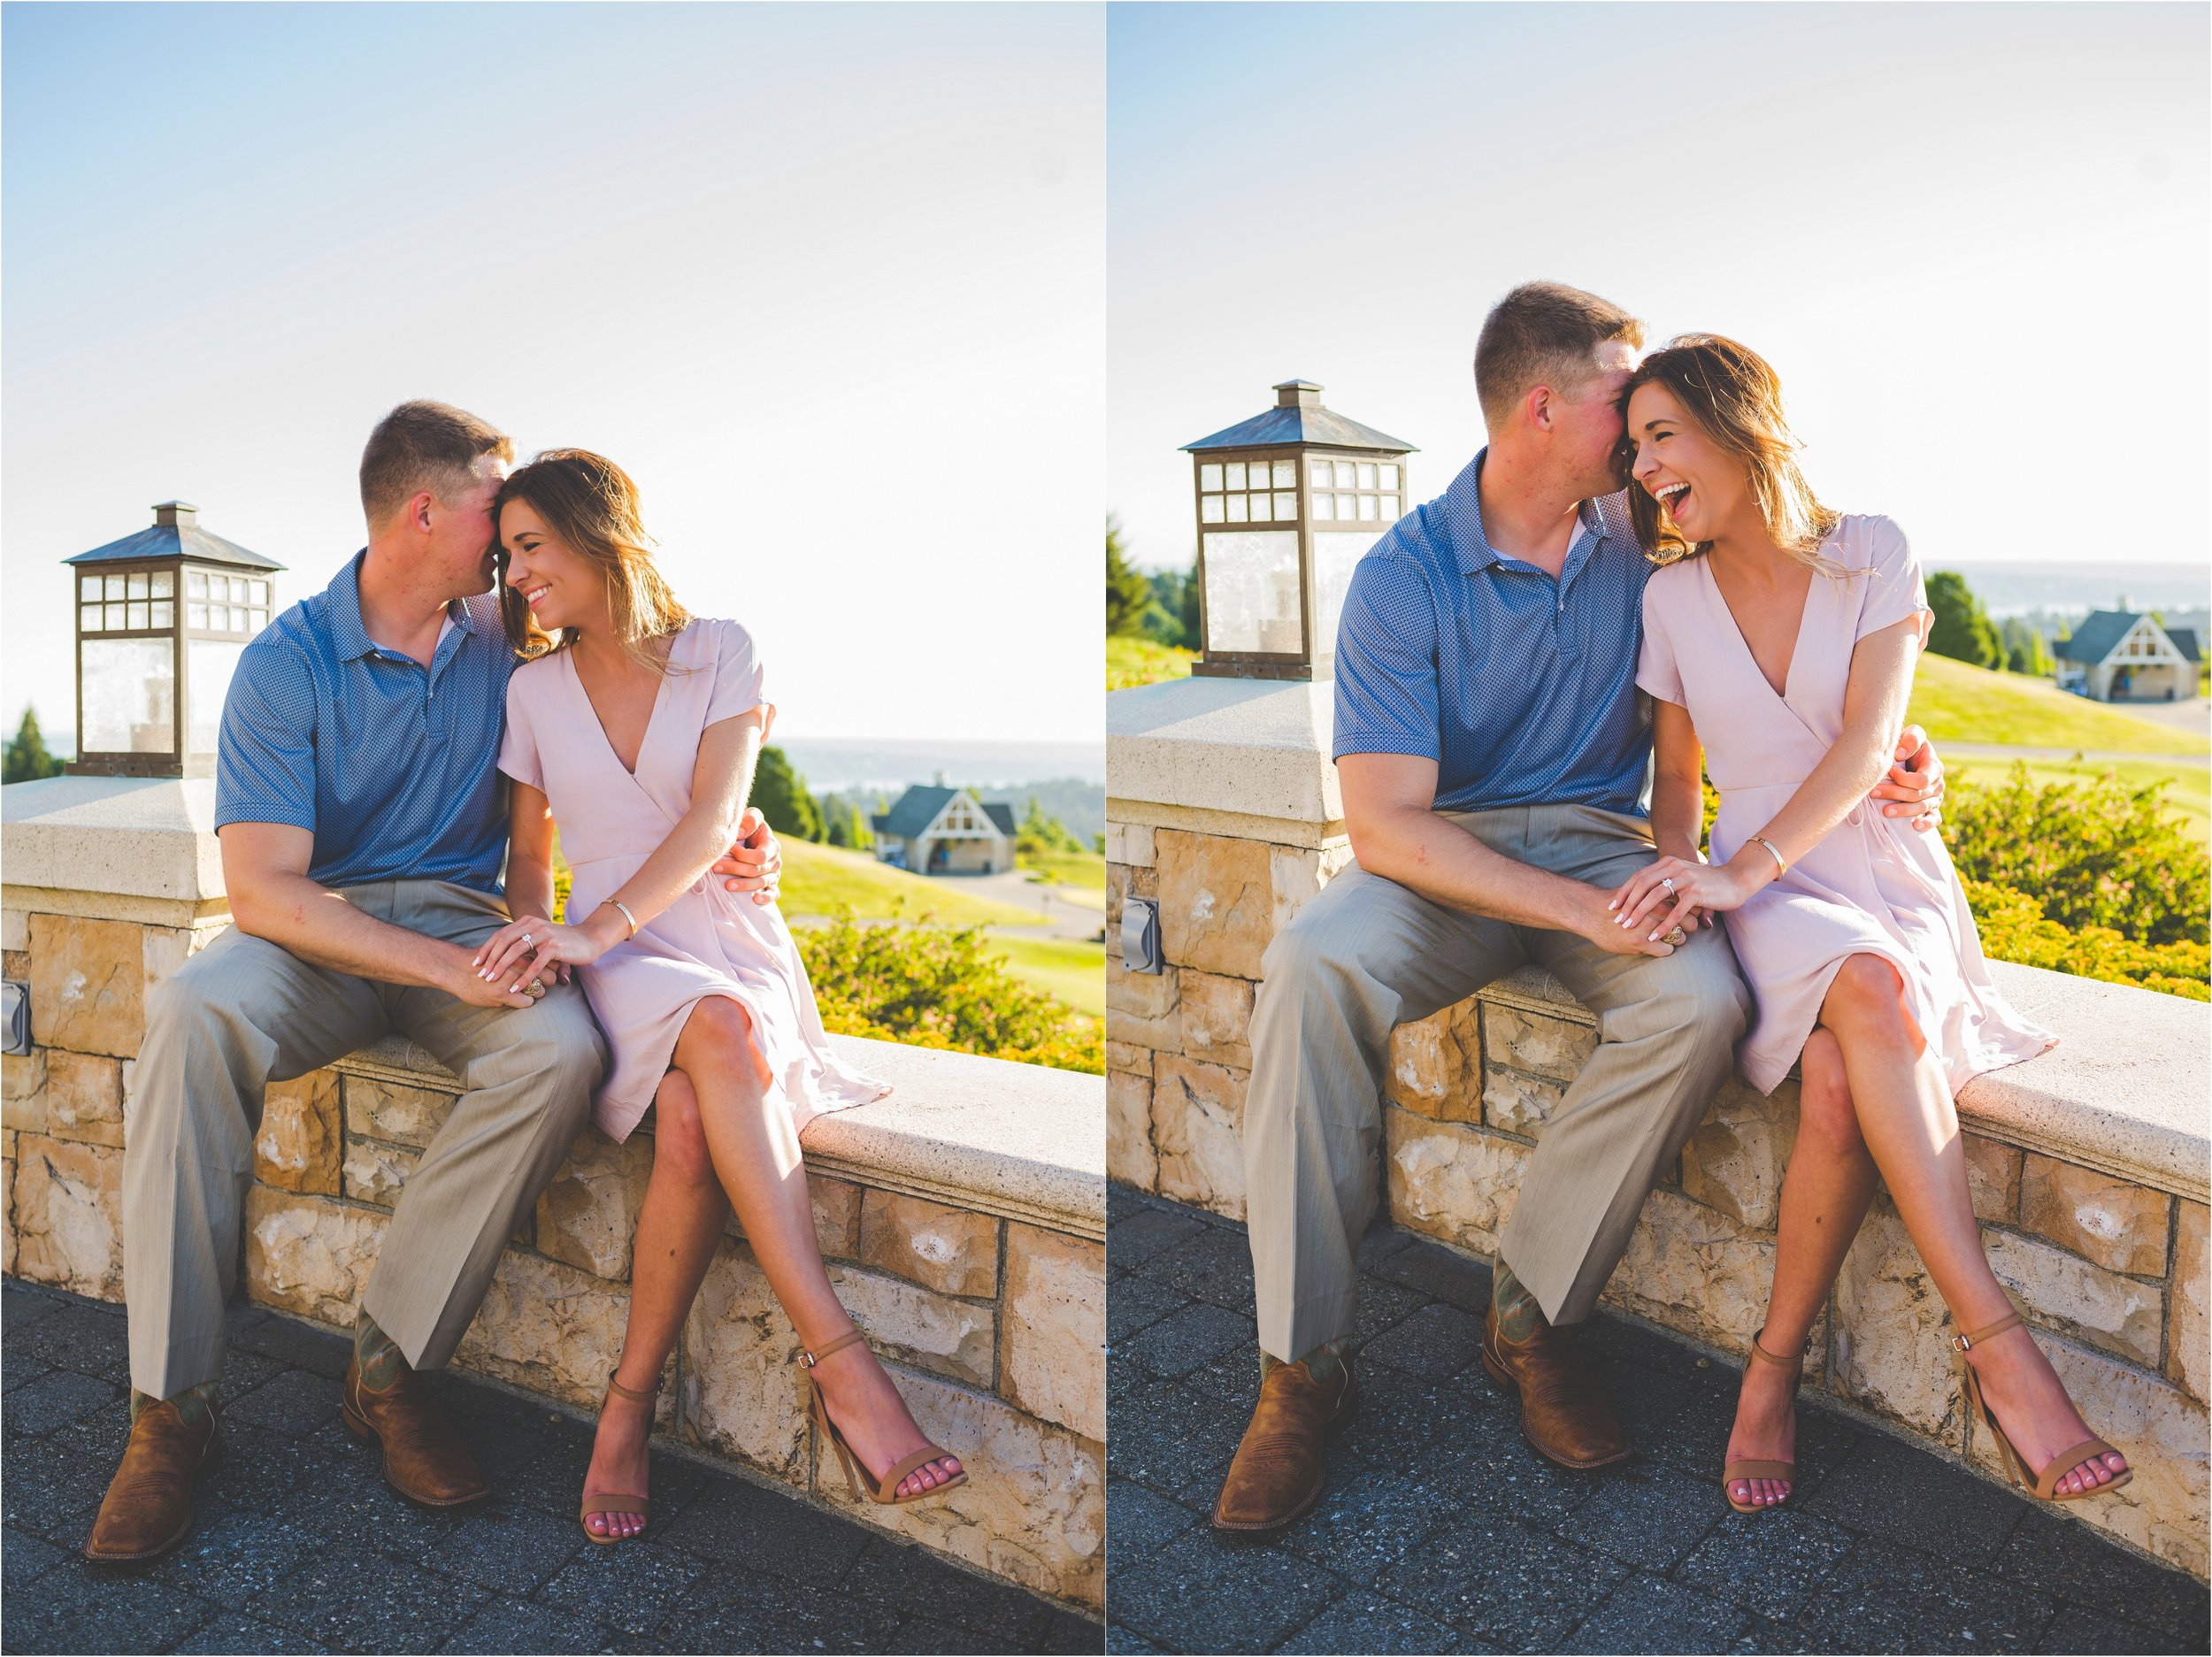 newcastle-golf-club-proposal-jannicka-mayte-seattle-washington-engagement-wedding-photographer_0023.jpg